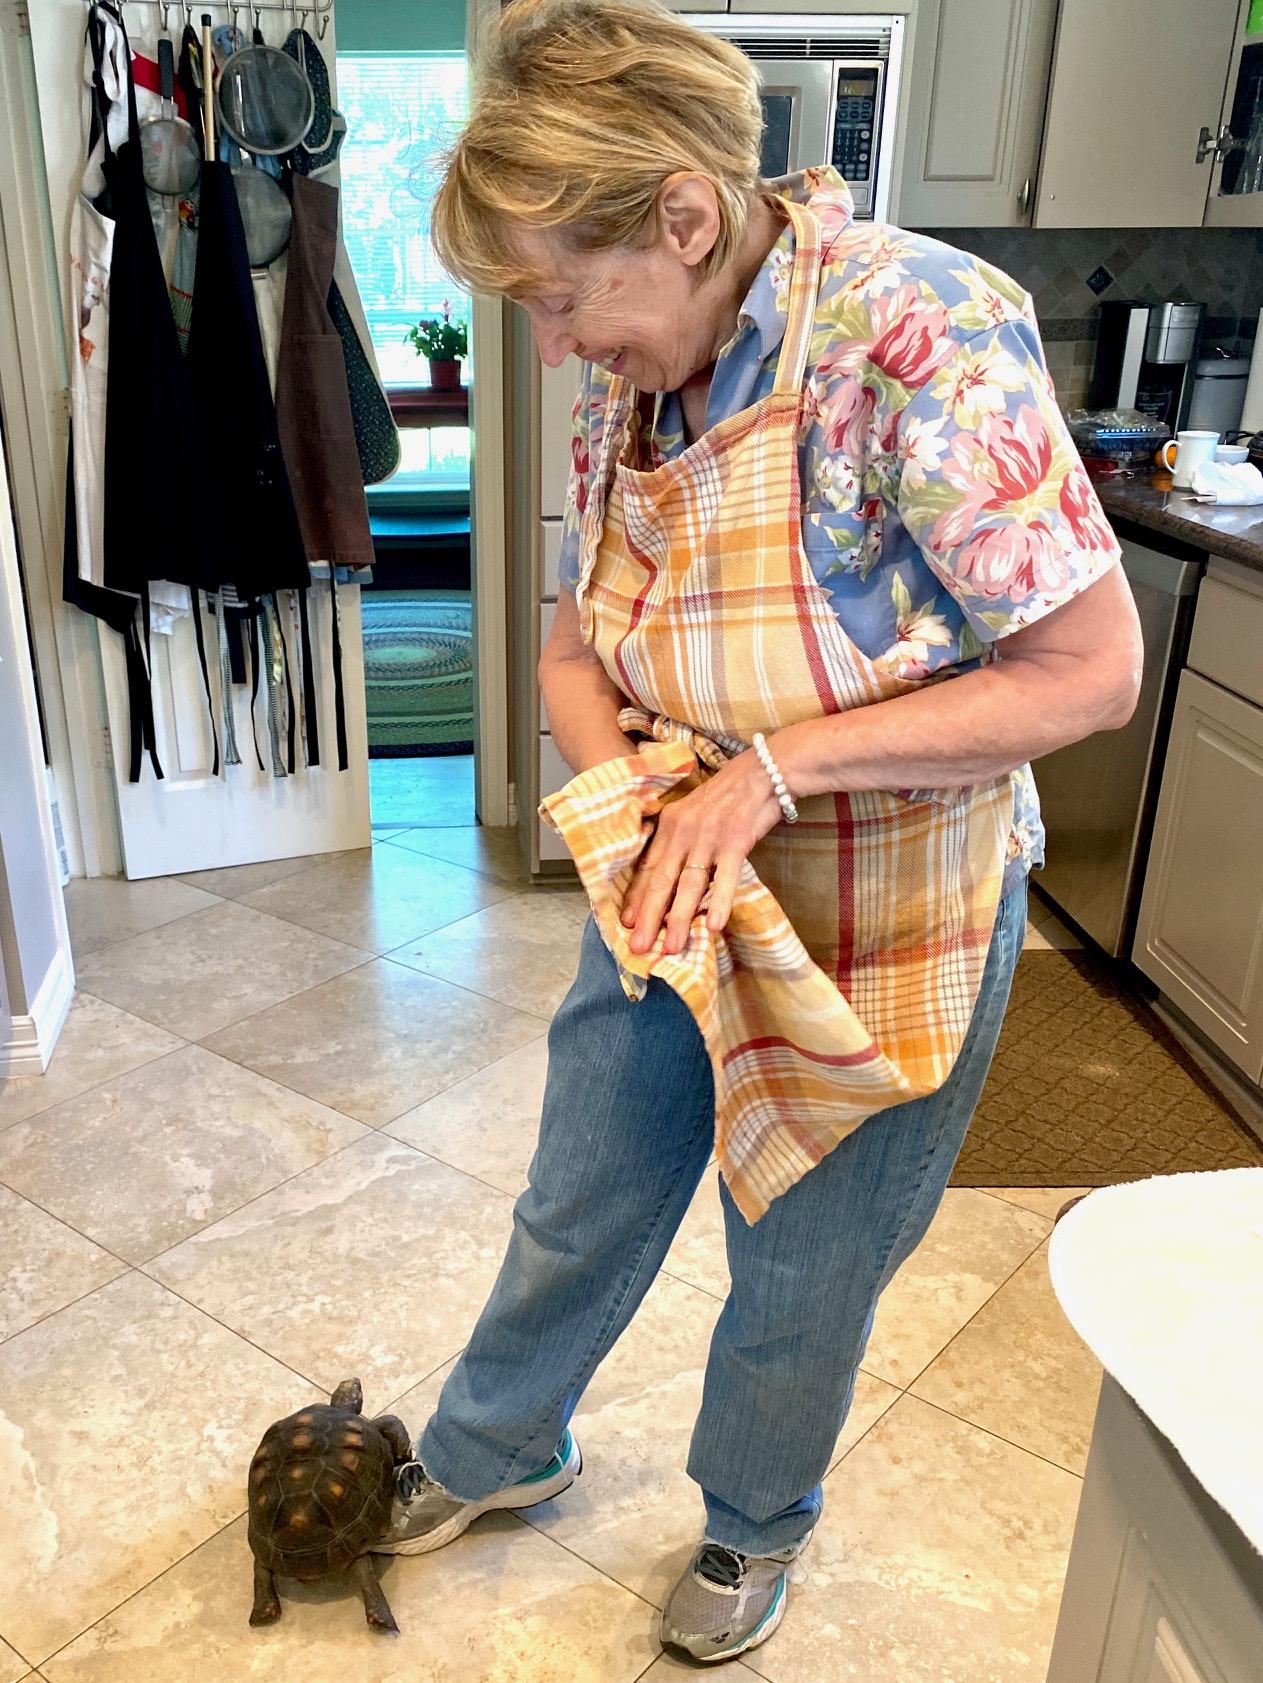 tortoise stands on grandma's leg